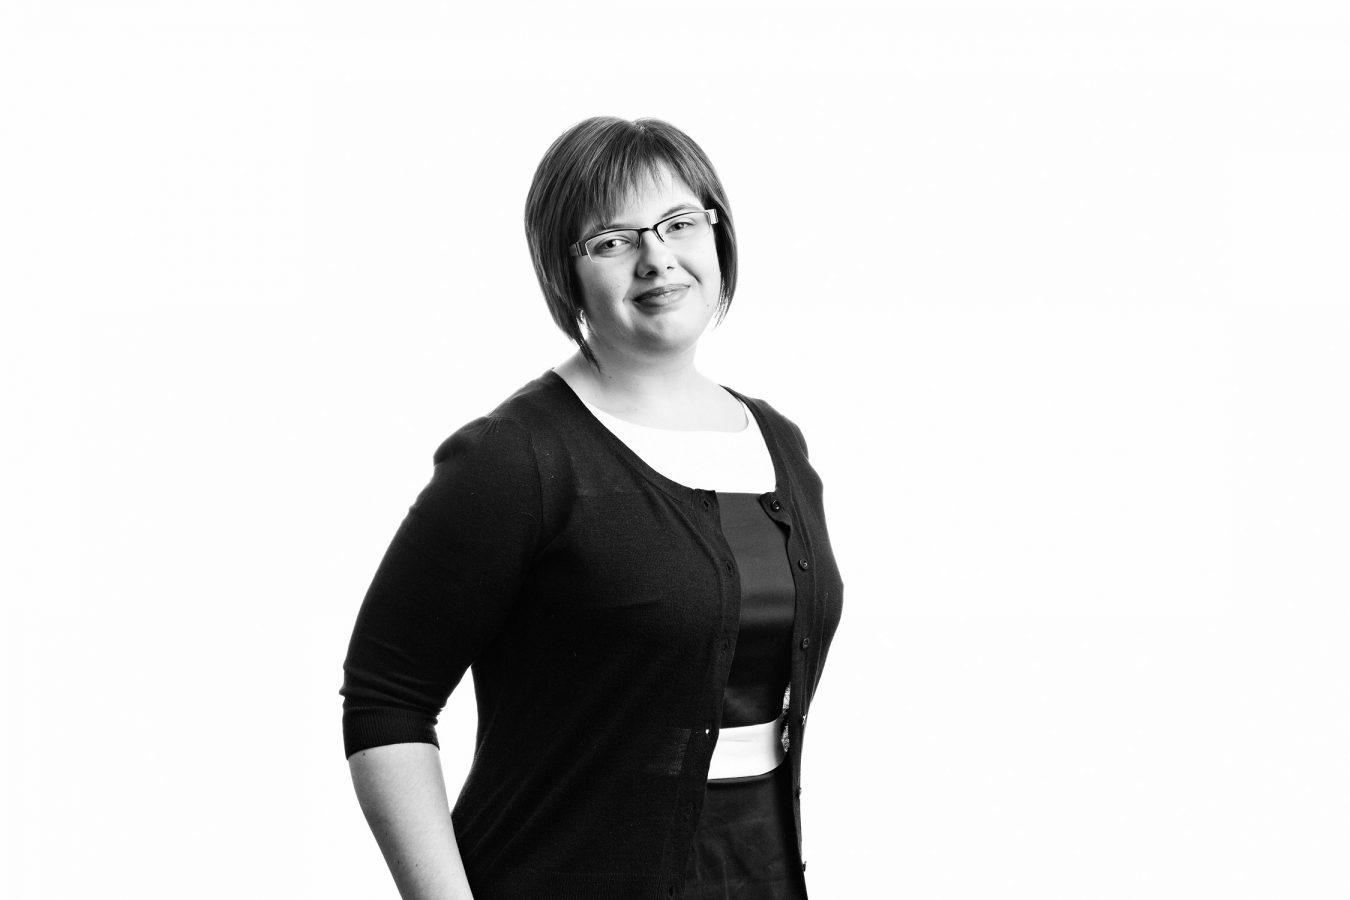 office-staff-portrait-woman-studio-black-and-white